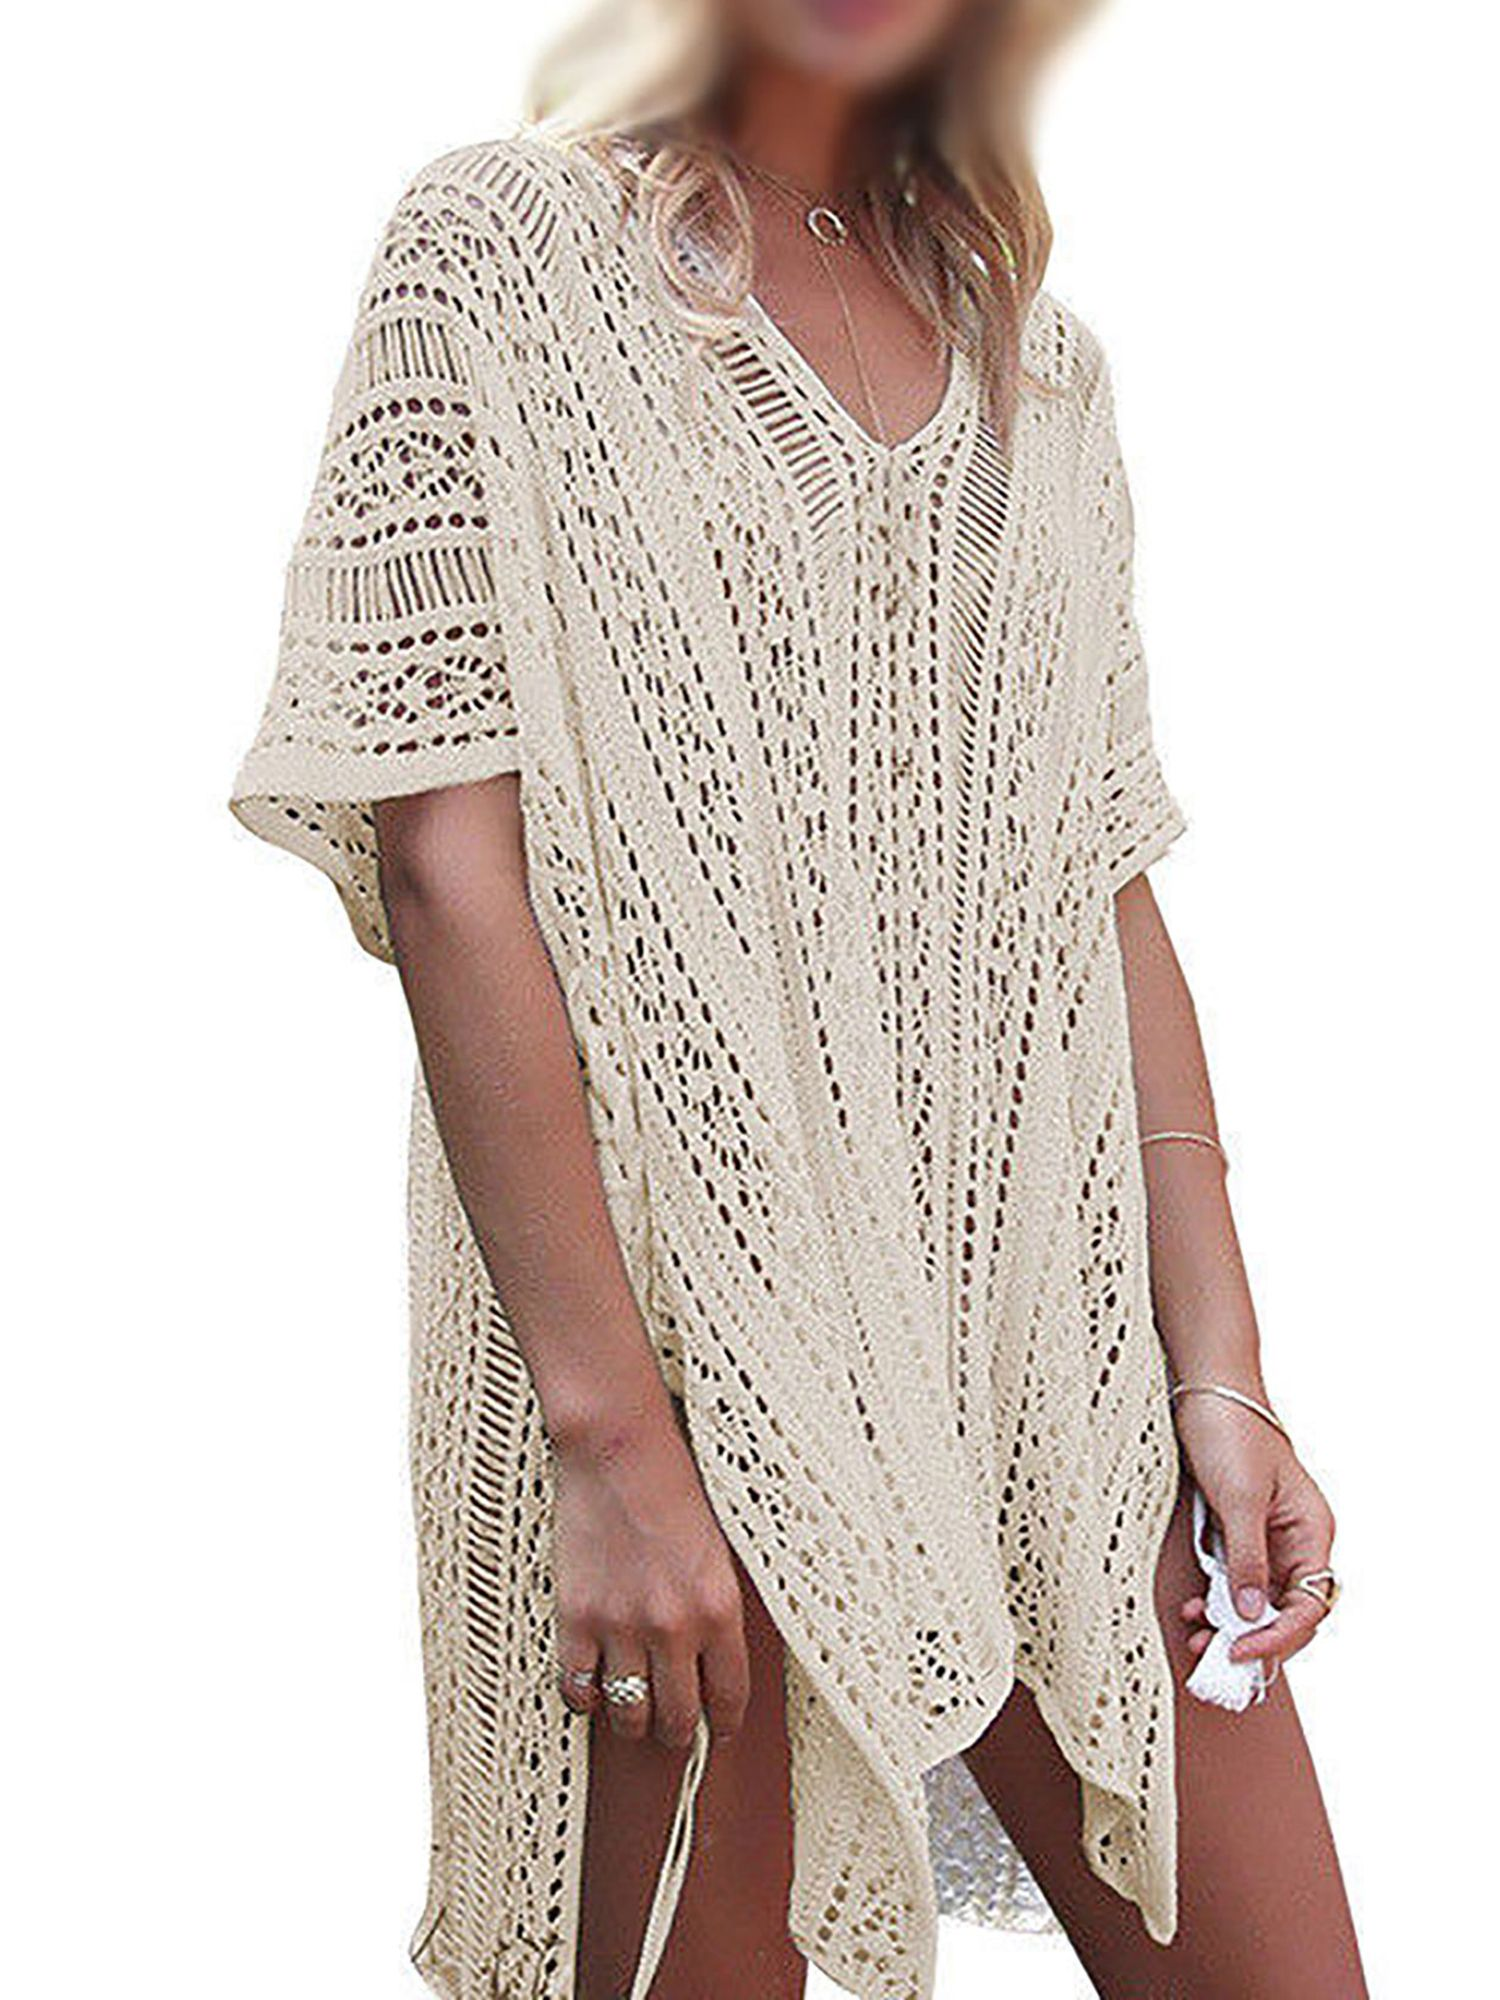 13829a99346 Womens Cover-ups Bohemian Knit Crochet Swim Bikini Tunic Beach Dress Tops  with Tassels Summer Beachwear Bathing Suit#Crochet, #Knit, #Bikini